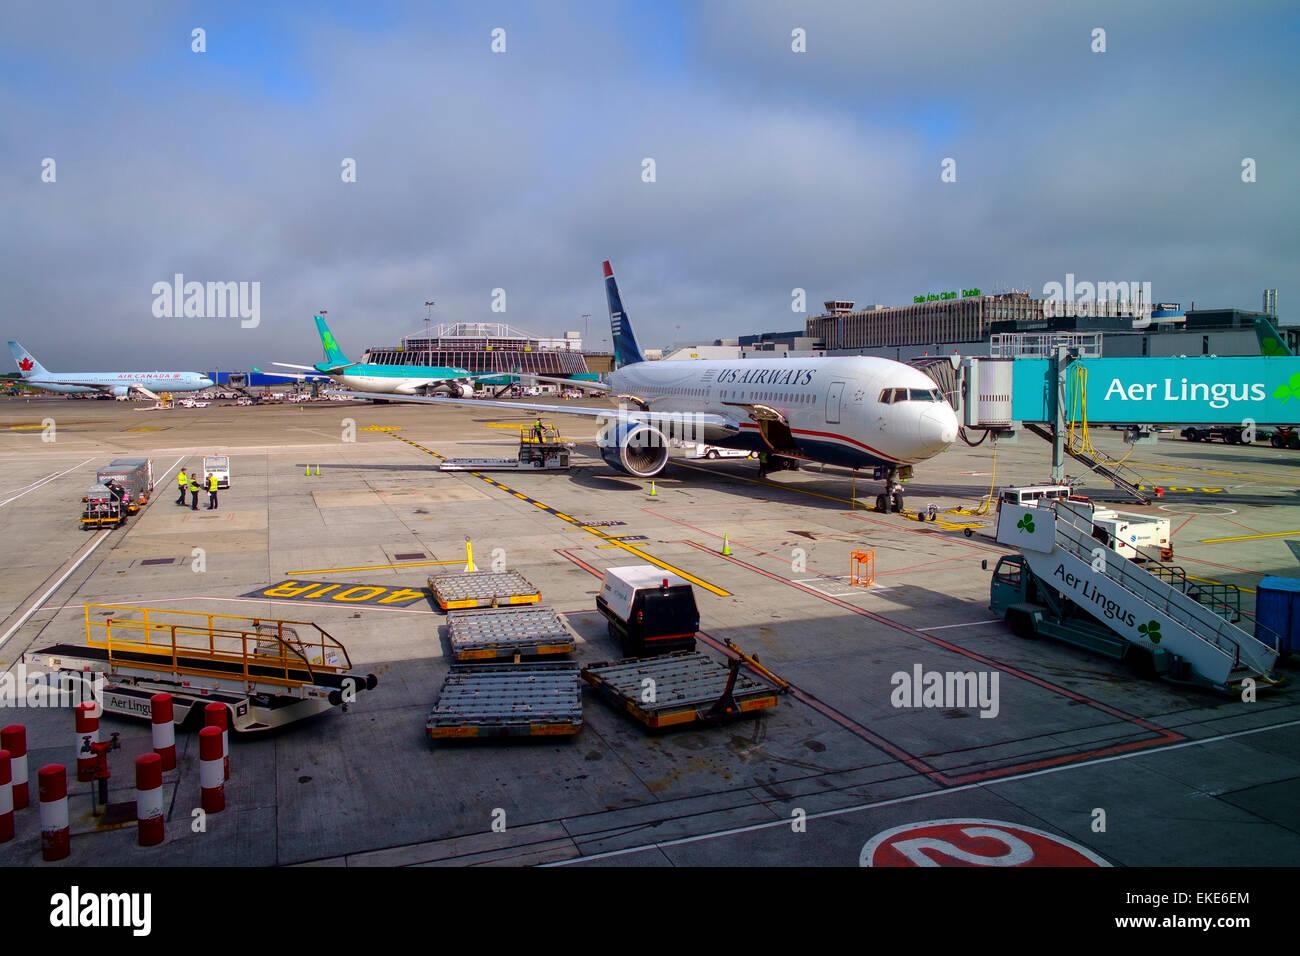 dublin airport aer lingus us airways Photo by Peter Cavanagh [Must Credit] - Stock Image